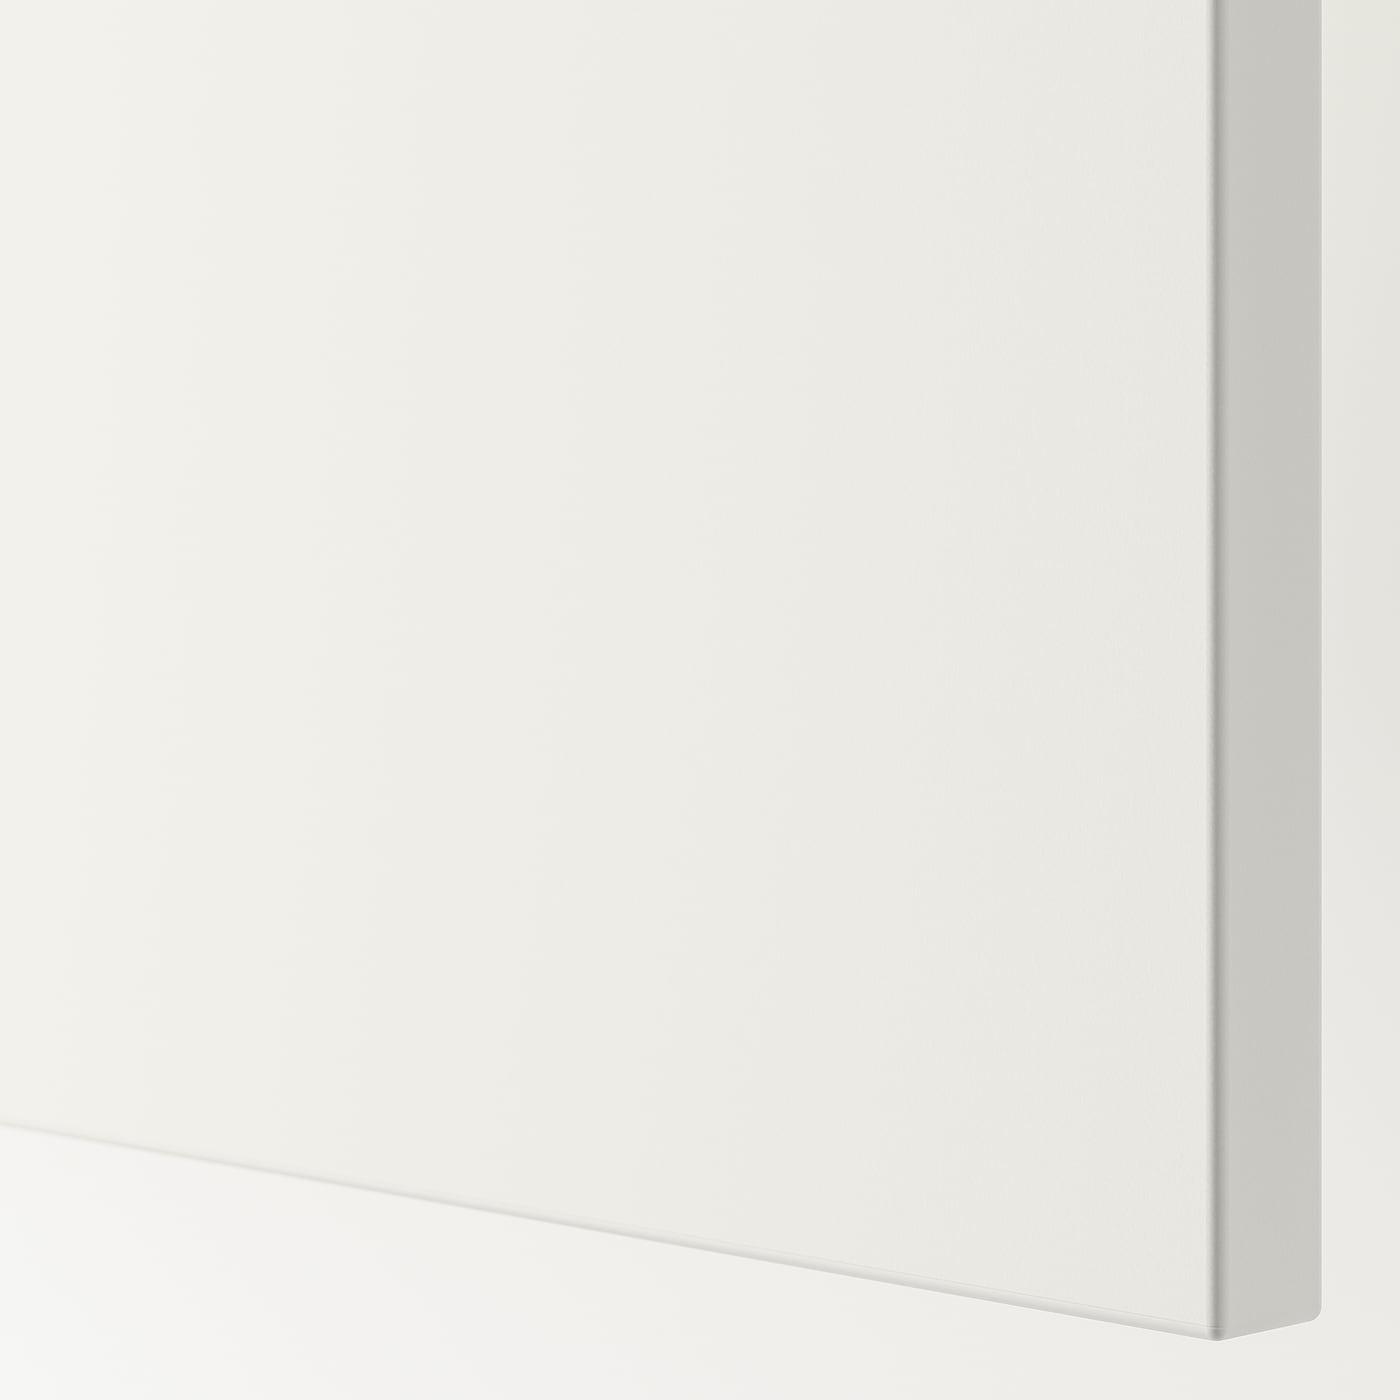 FONNES Vrata, bela, 60x180 cm